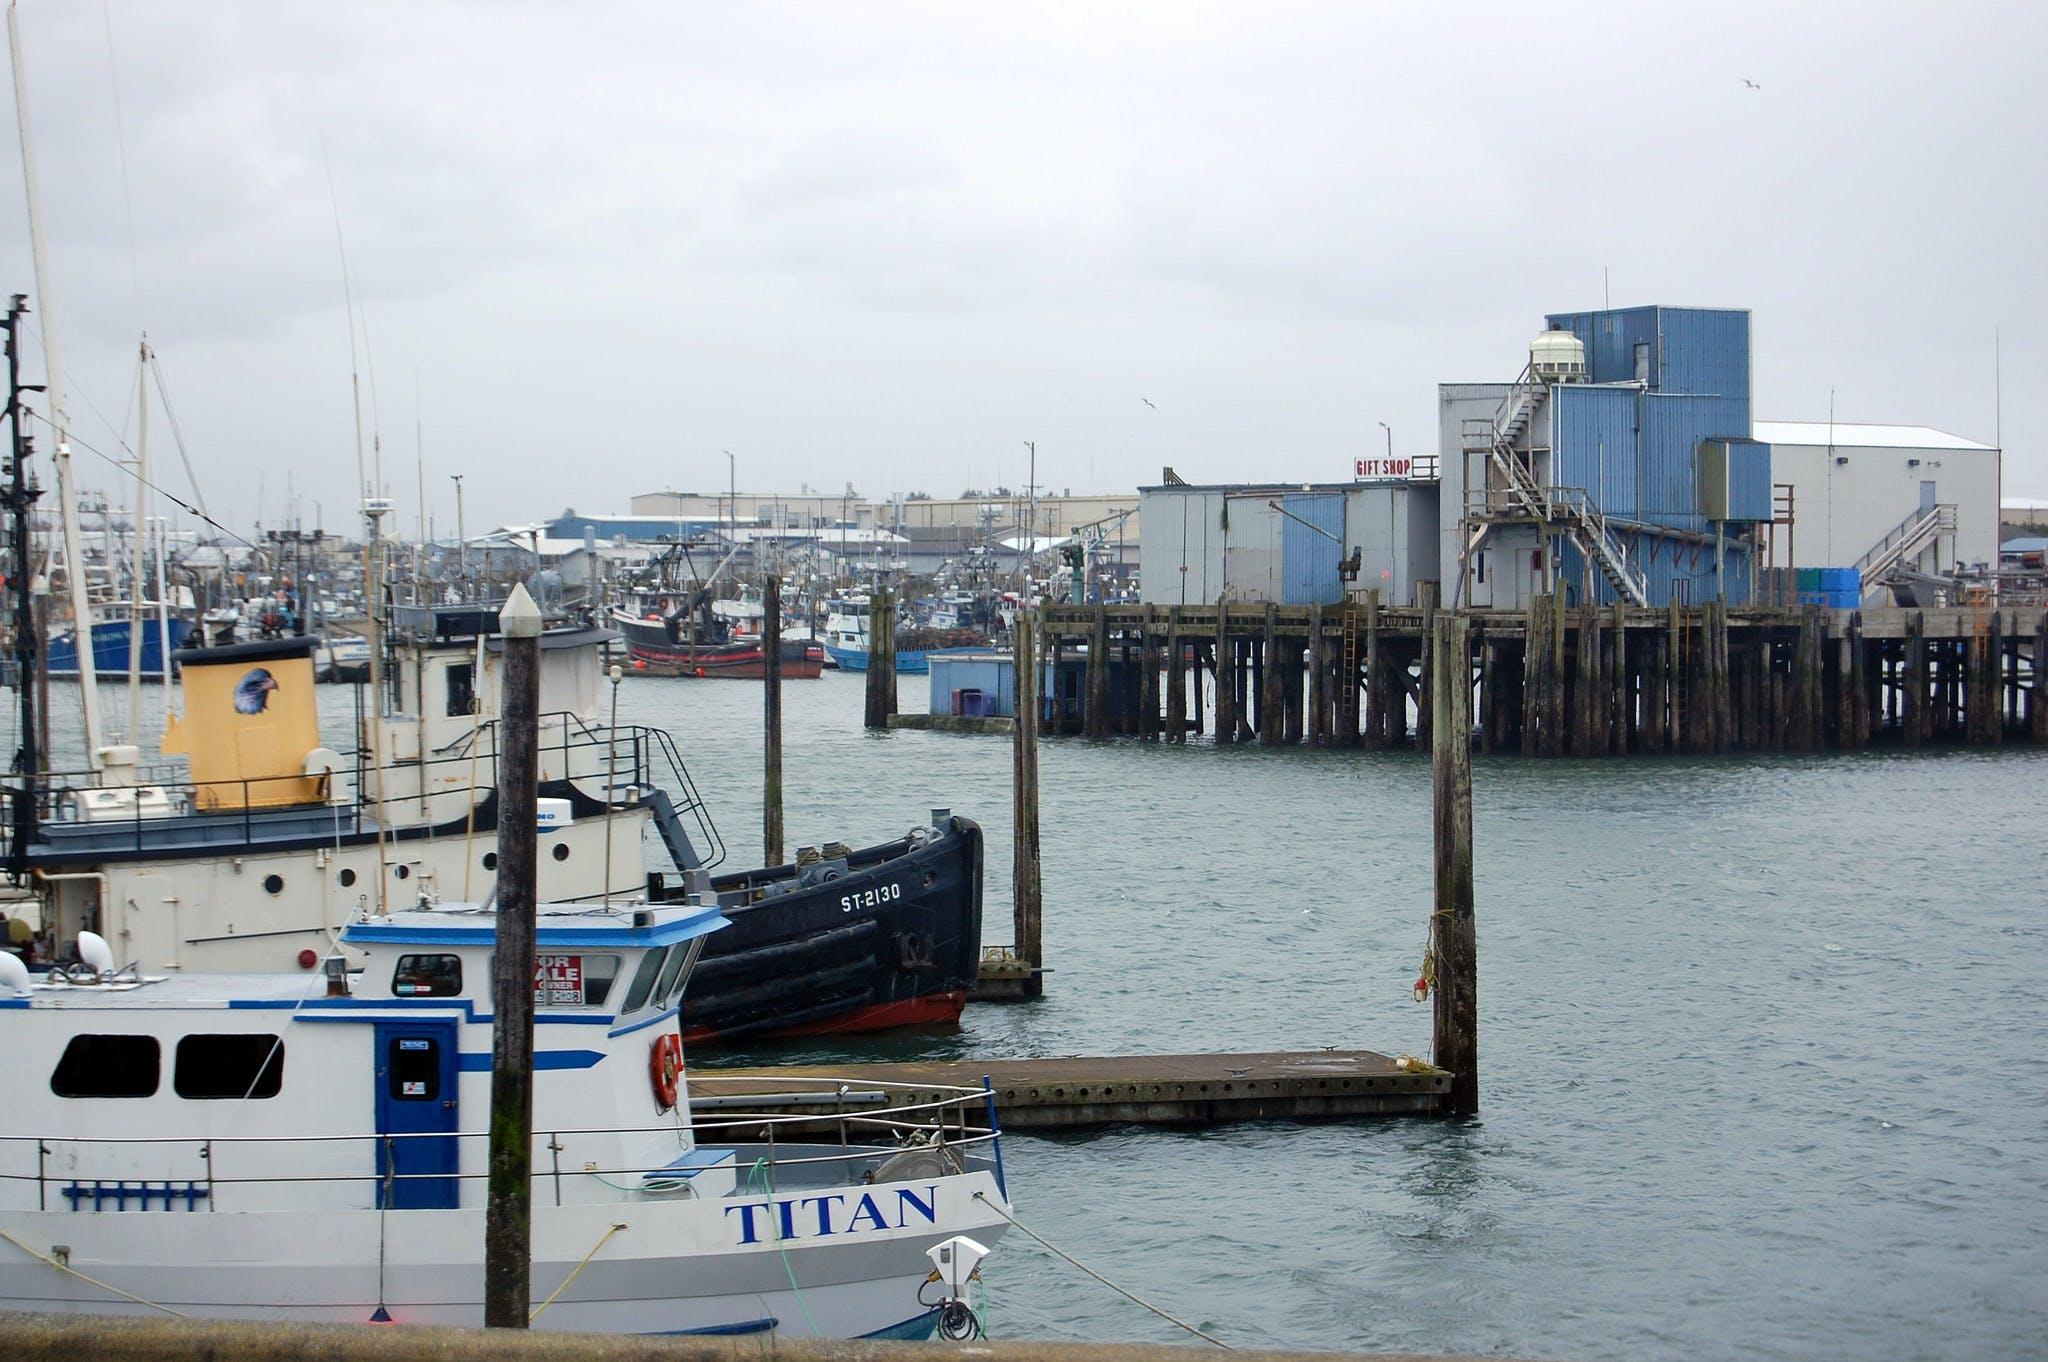 boats anchored at the docks on a cloudy day near westport, washington